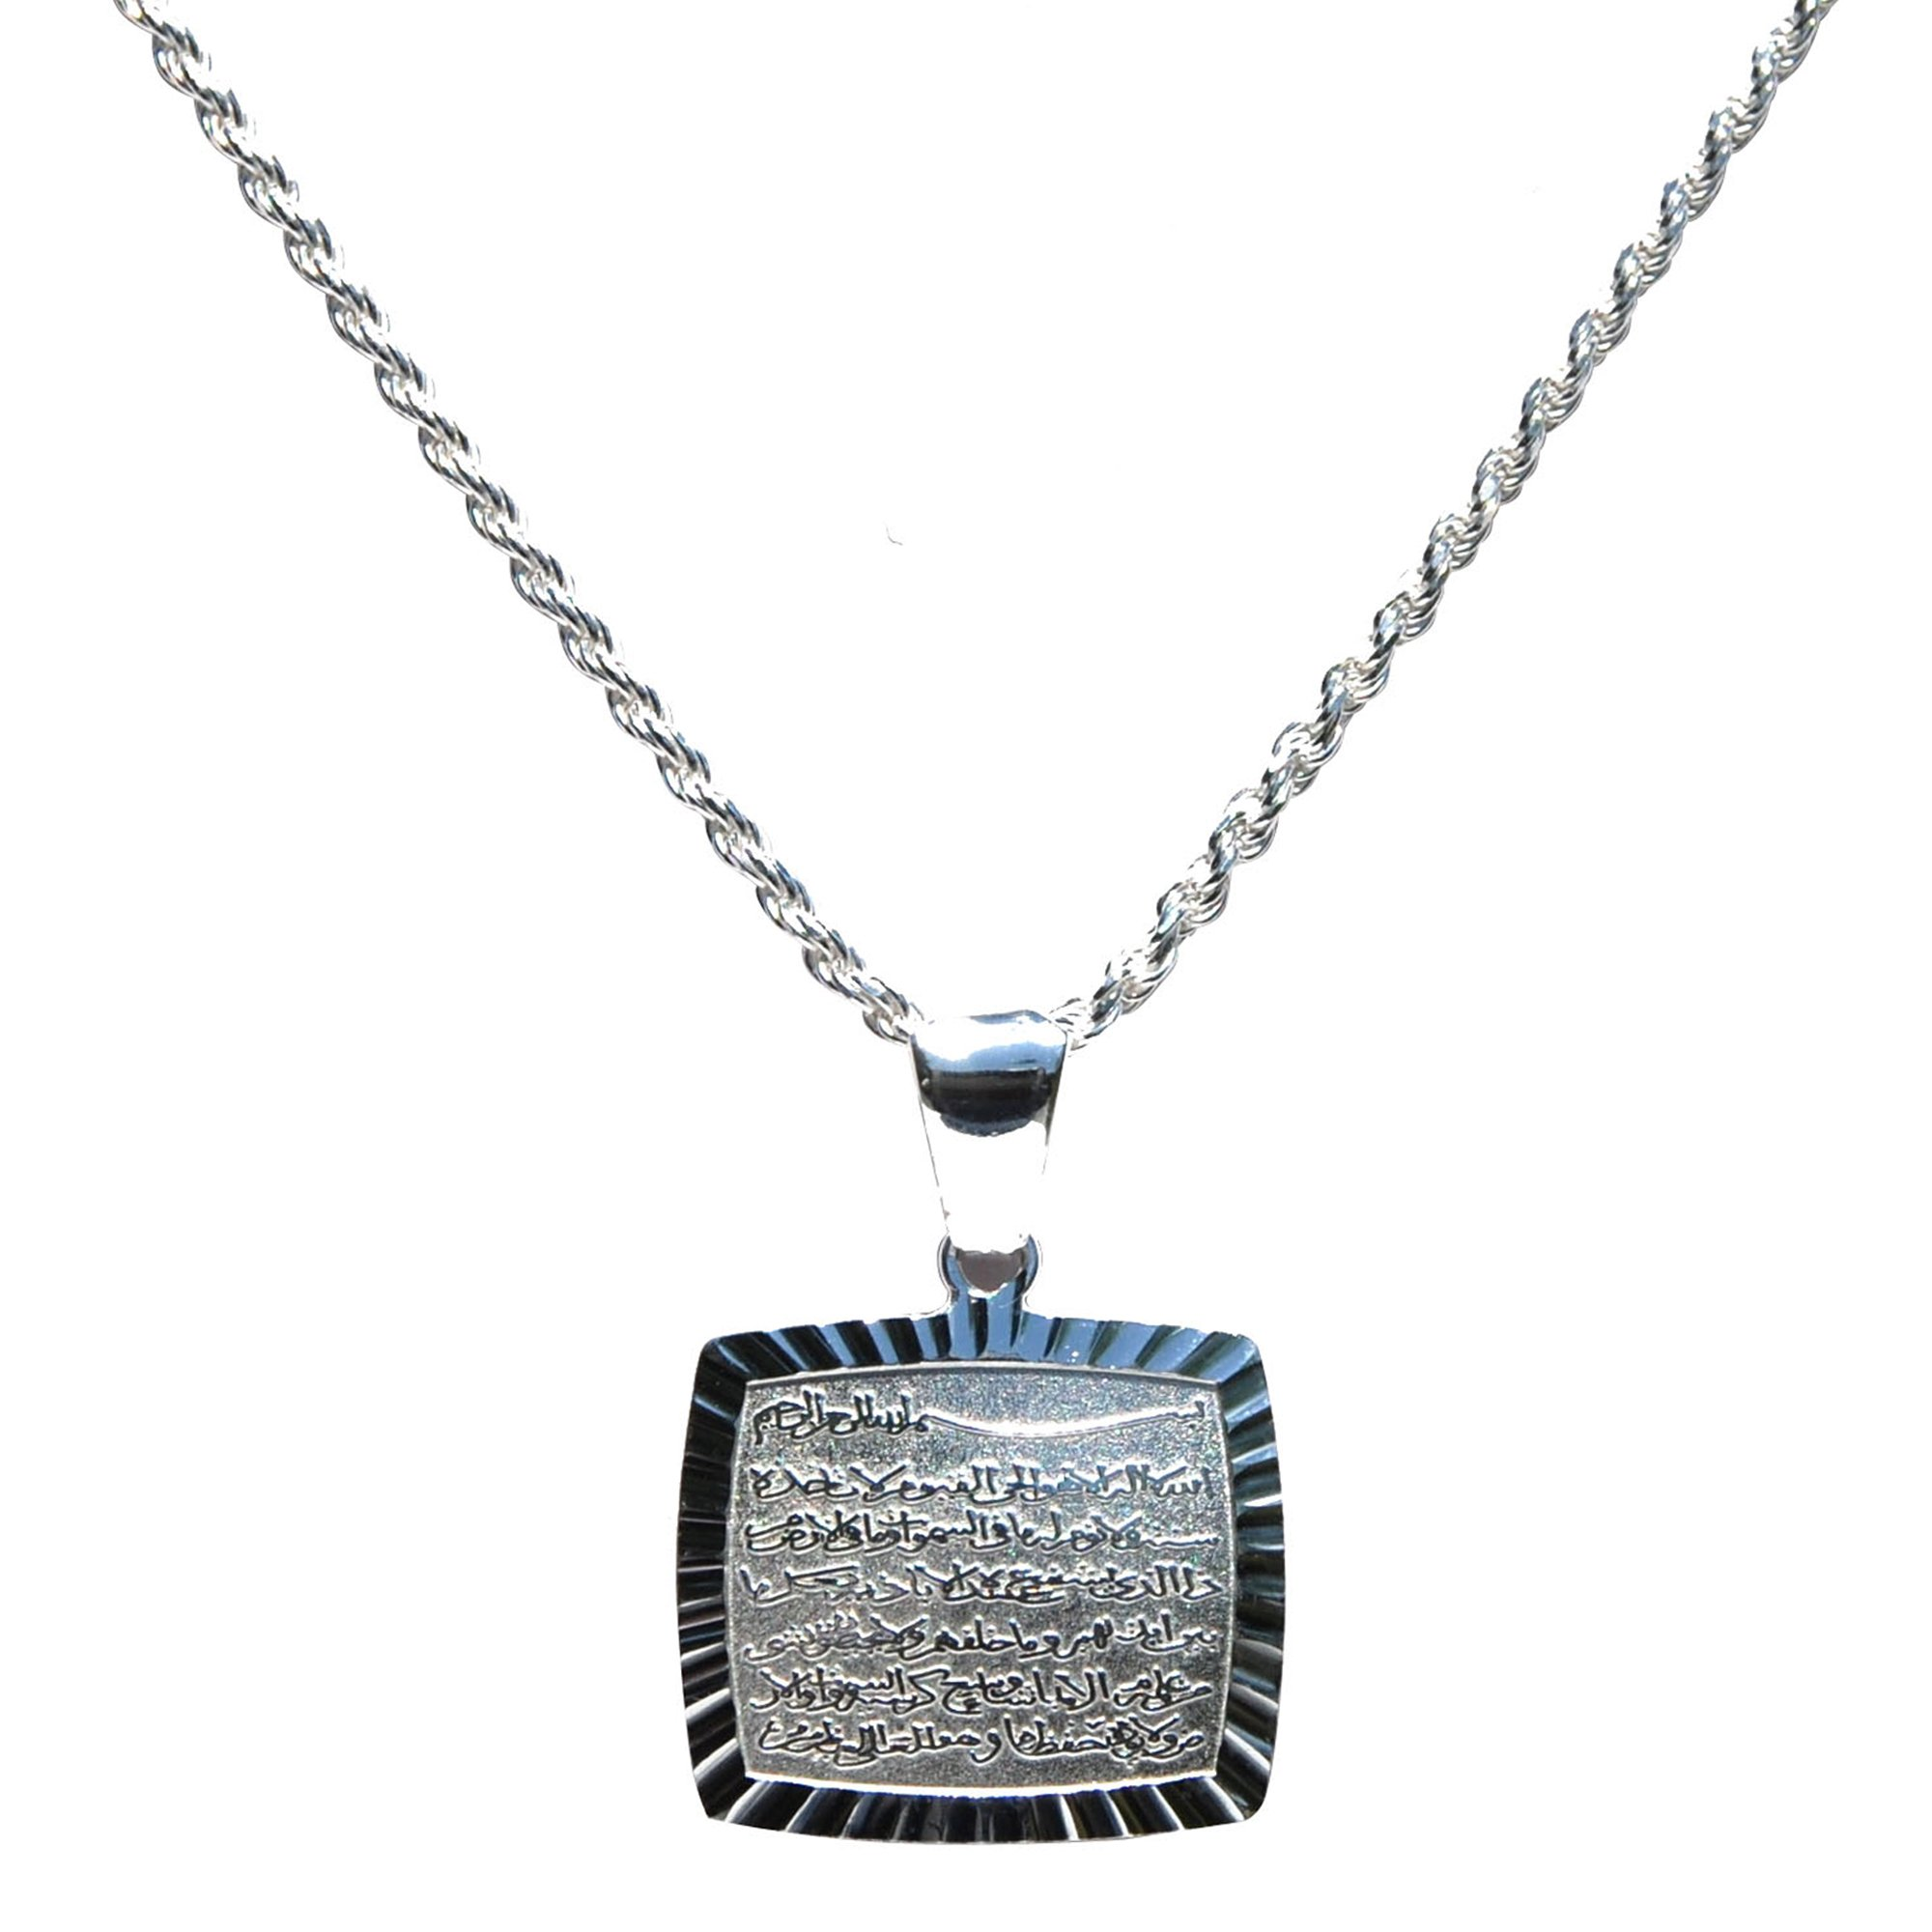 "Shiny Square St. Silver Ayatul-Kursi (Vers of The Throne) Quran Muslim Pendant w/ 20"" Italian Rope Chain"